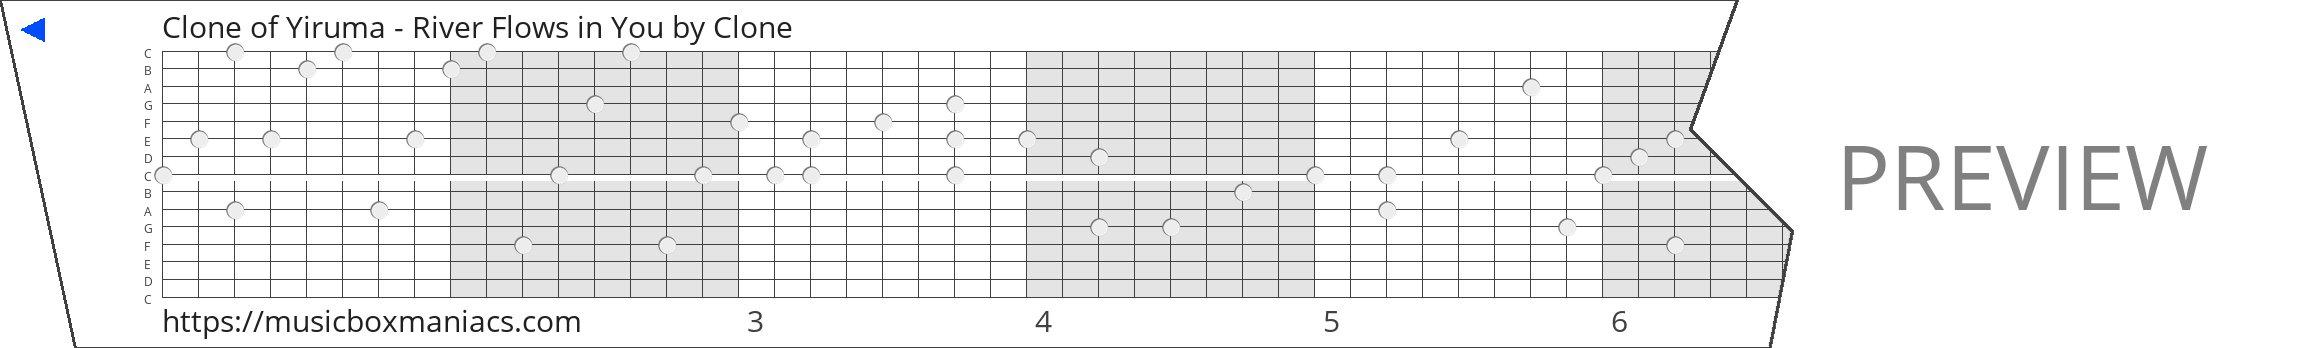 Clone of Yiruma - River Flows in You 15 note music box paper strip